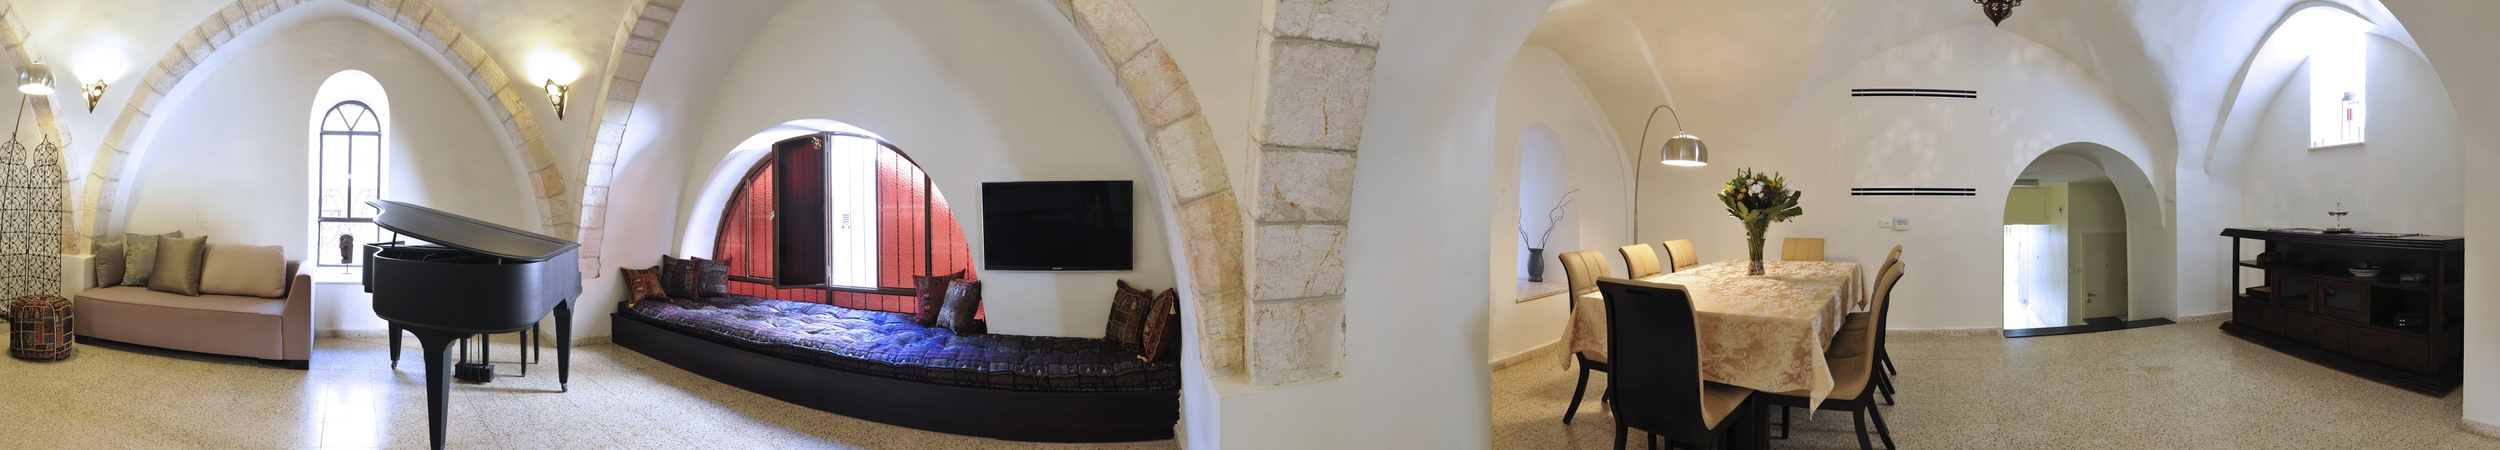 13 - Living Room Panorama.jpg